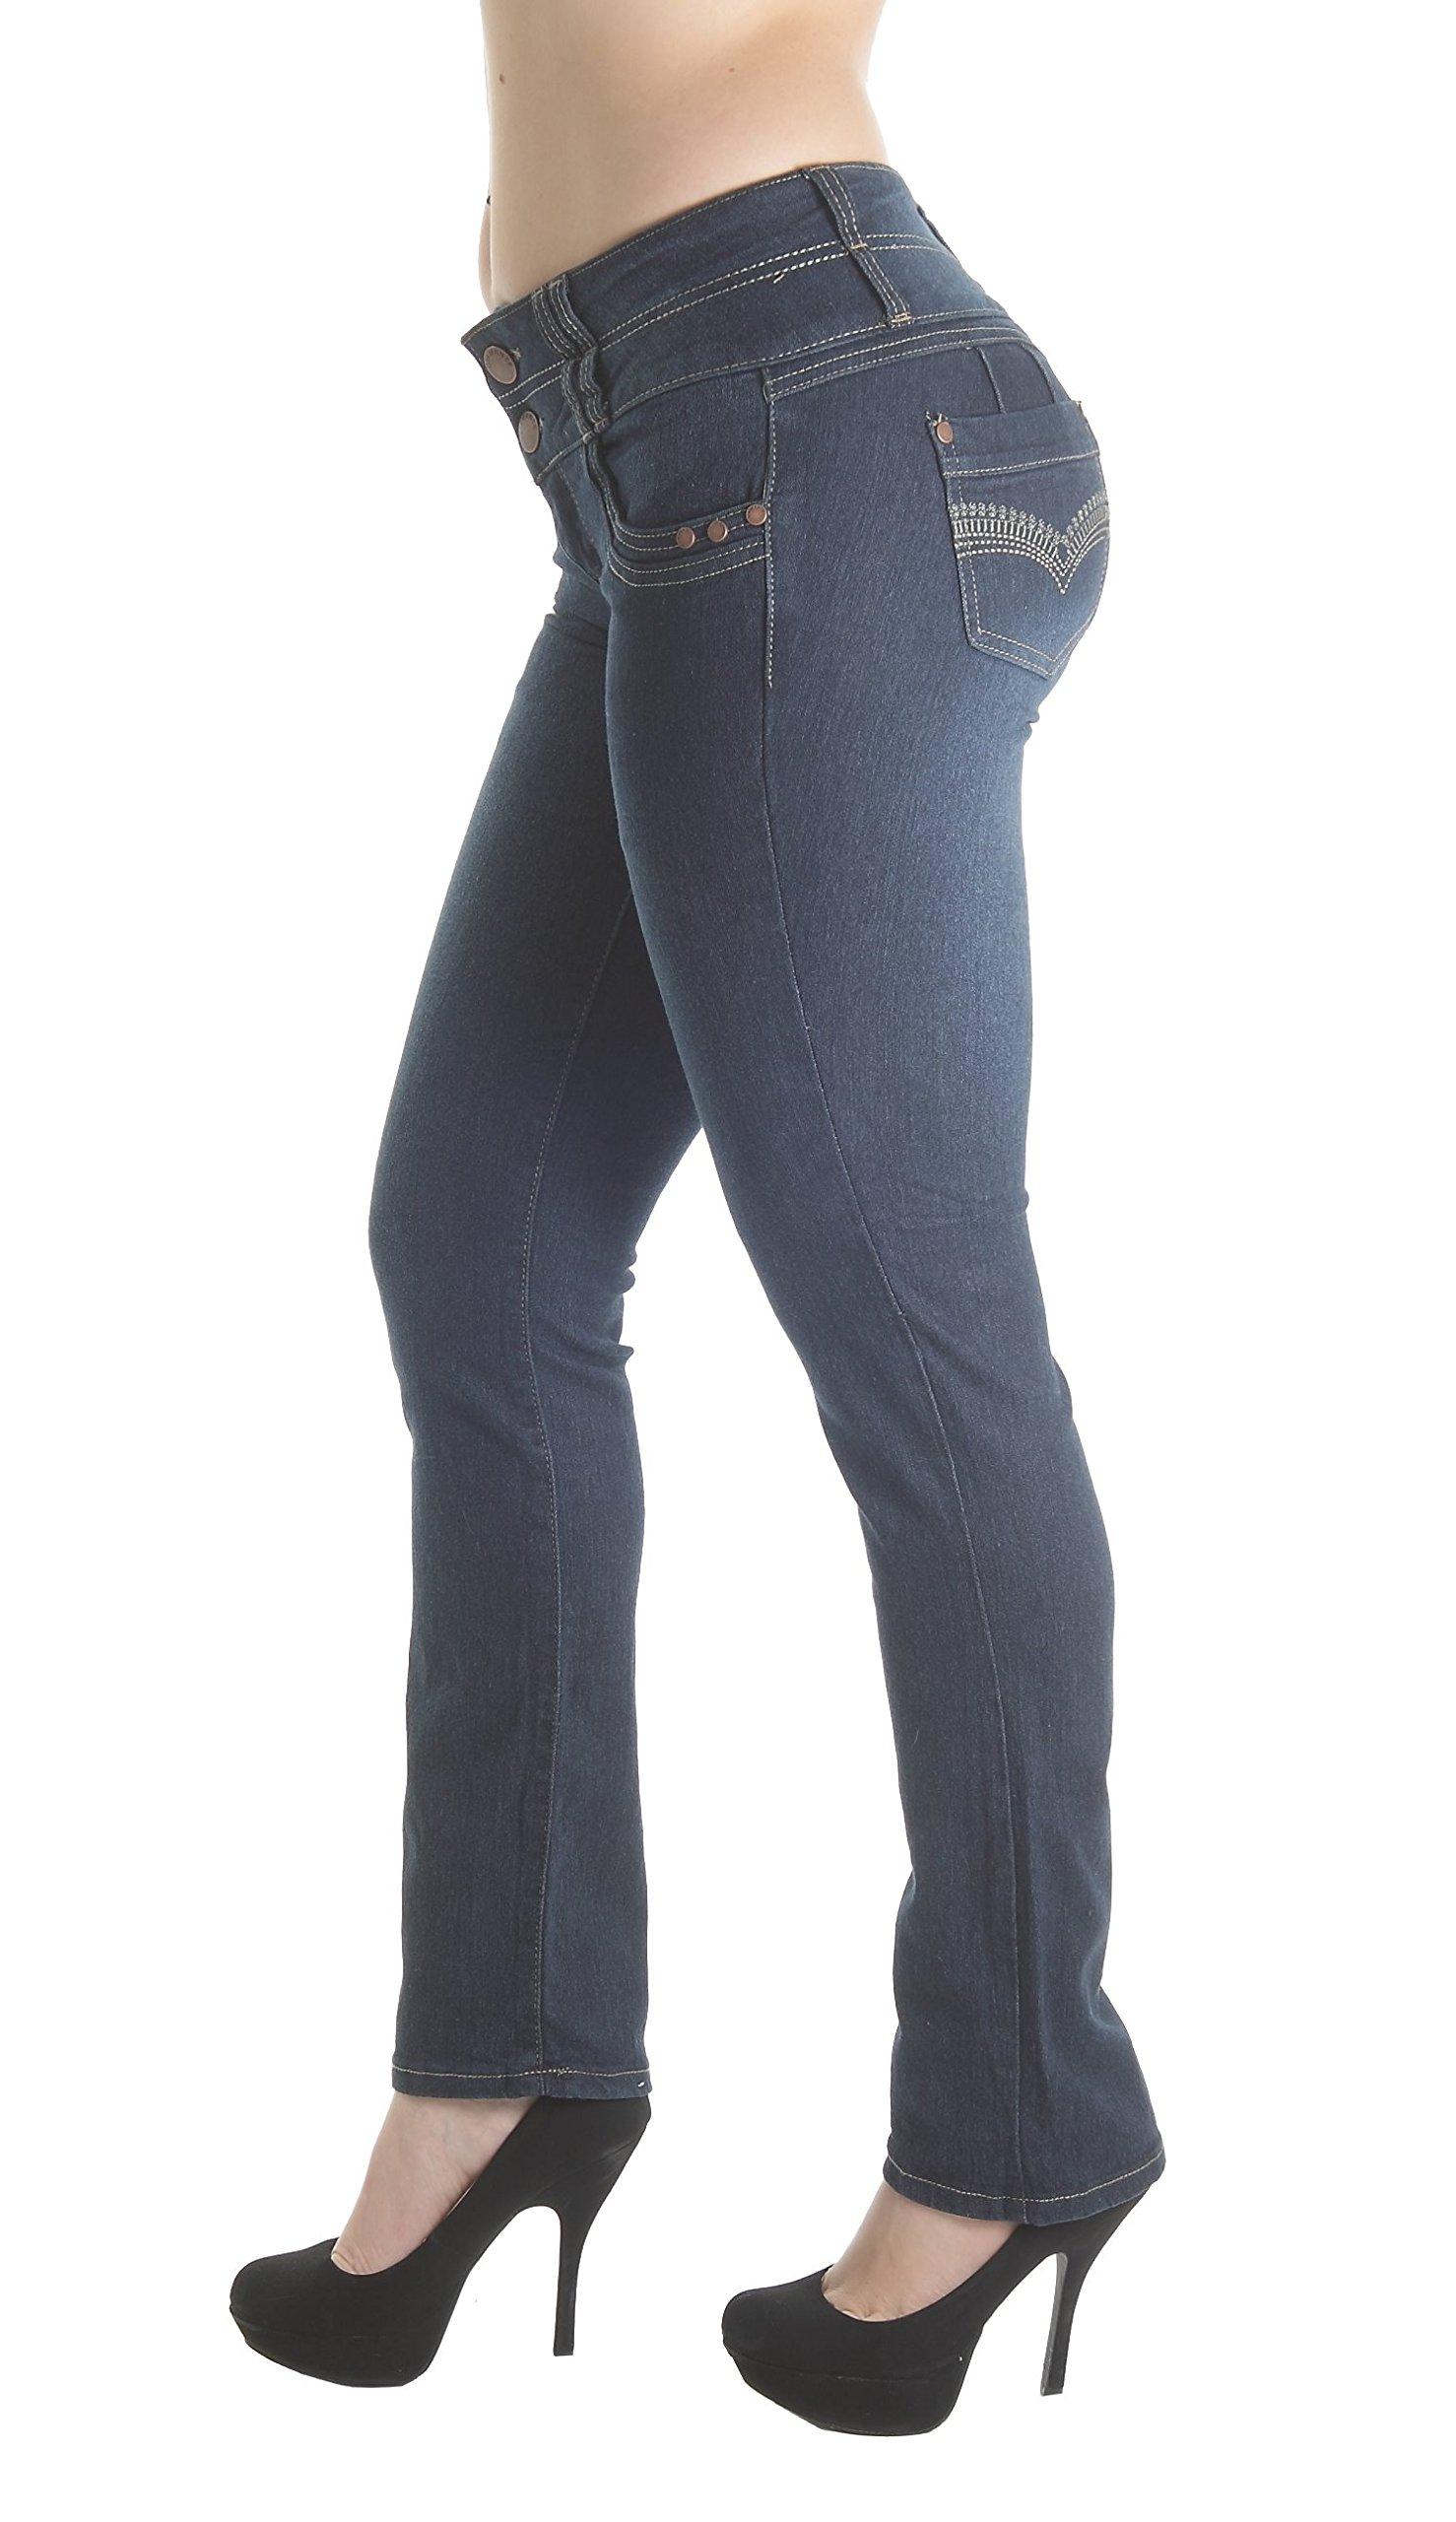 Fashion2Love FCH159BT – Colombian Design, Butt Lift, Levanta Cola, Mid Waist, Boot Leg Jeans in Navy Size 5